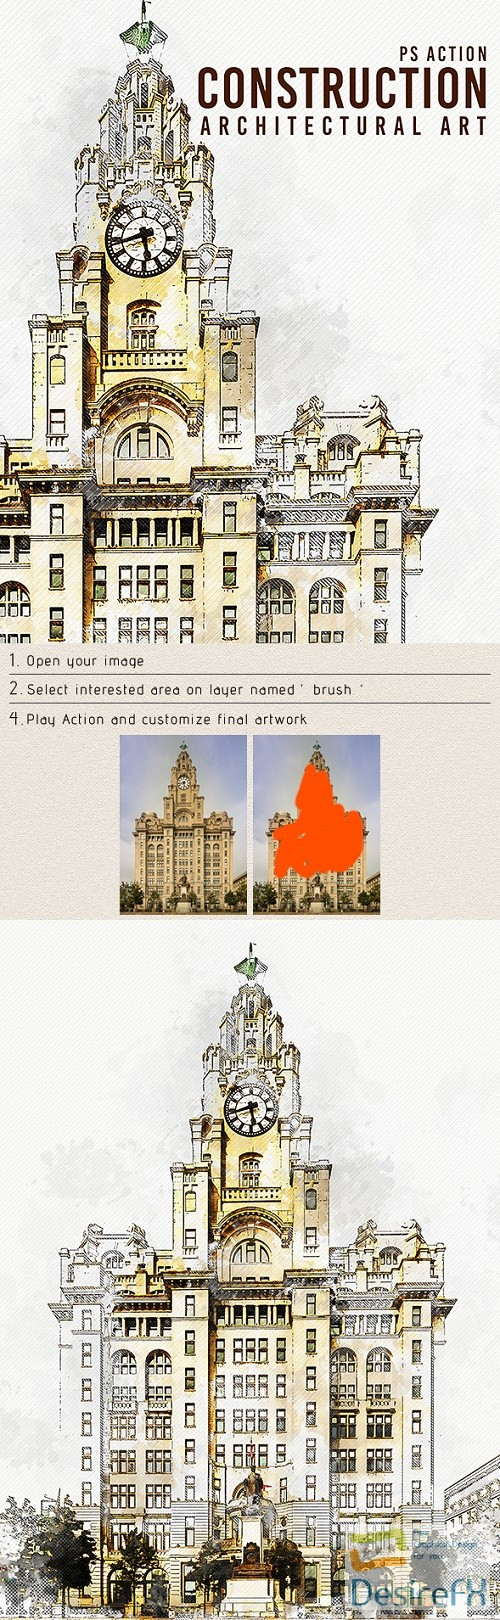 actions-atn - Construction - Architectural Art Photoshop Action 22620889